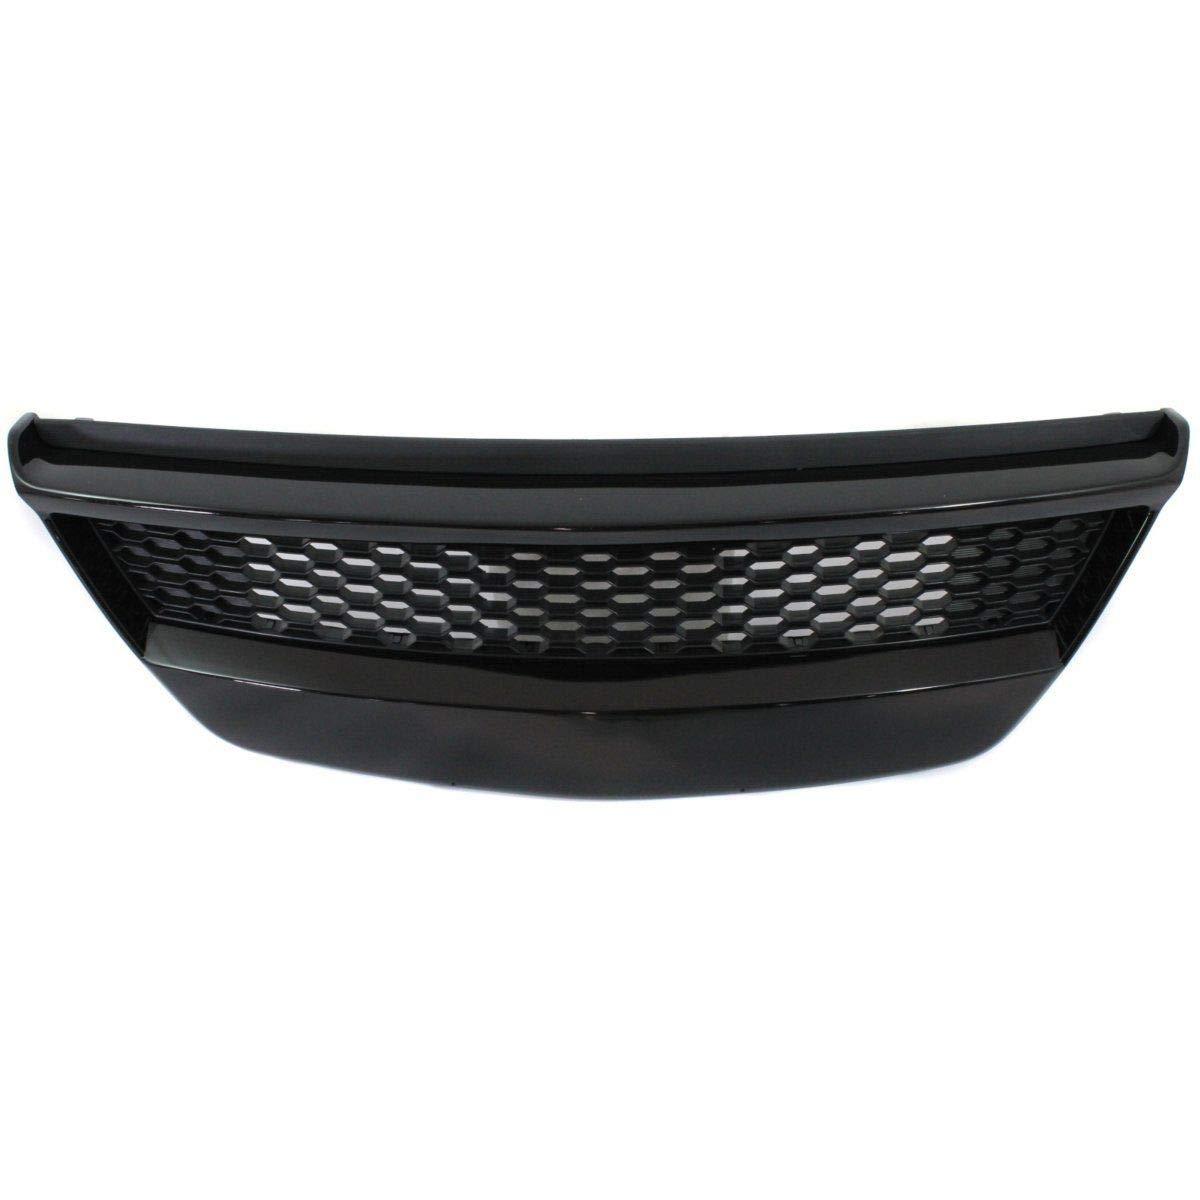 New Front Bumper Grille For 2010-2013 Kia Forte Type Black Coupe KI1036108